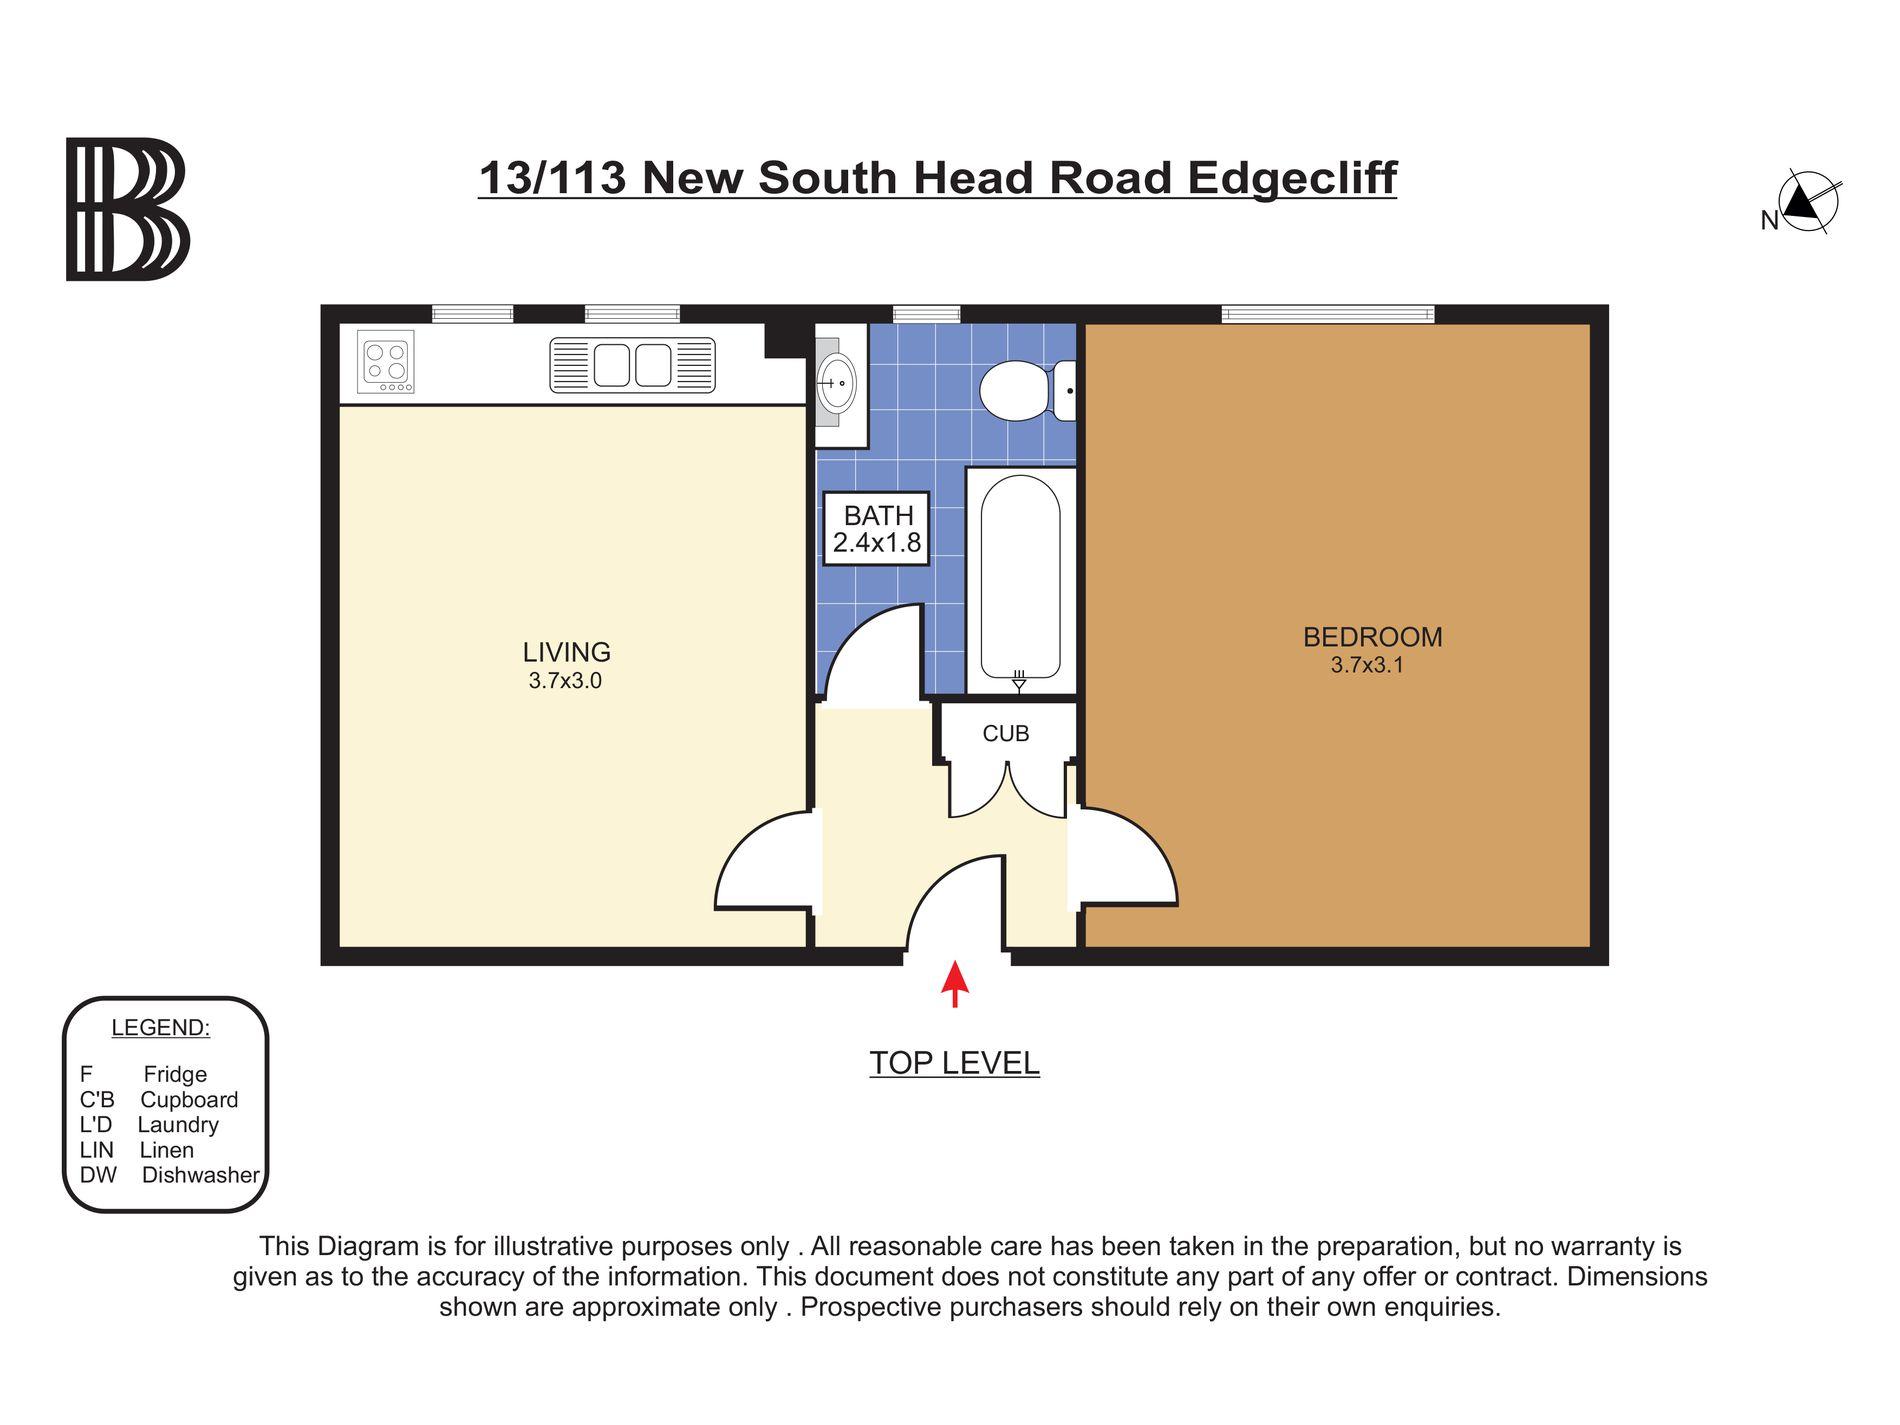 13 / 113 New South Head Road, Edgecliff